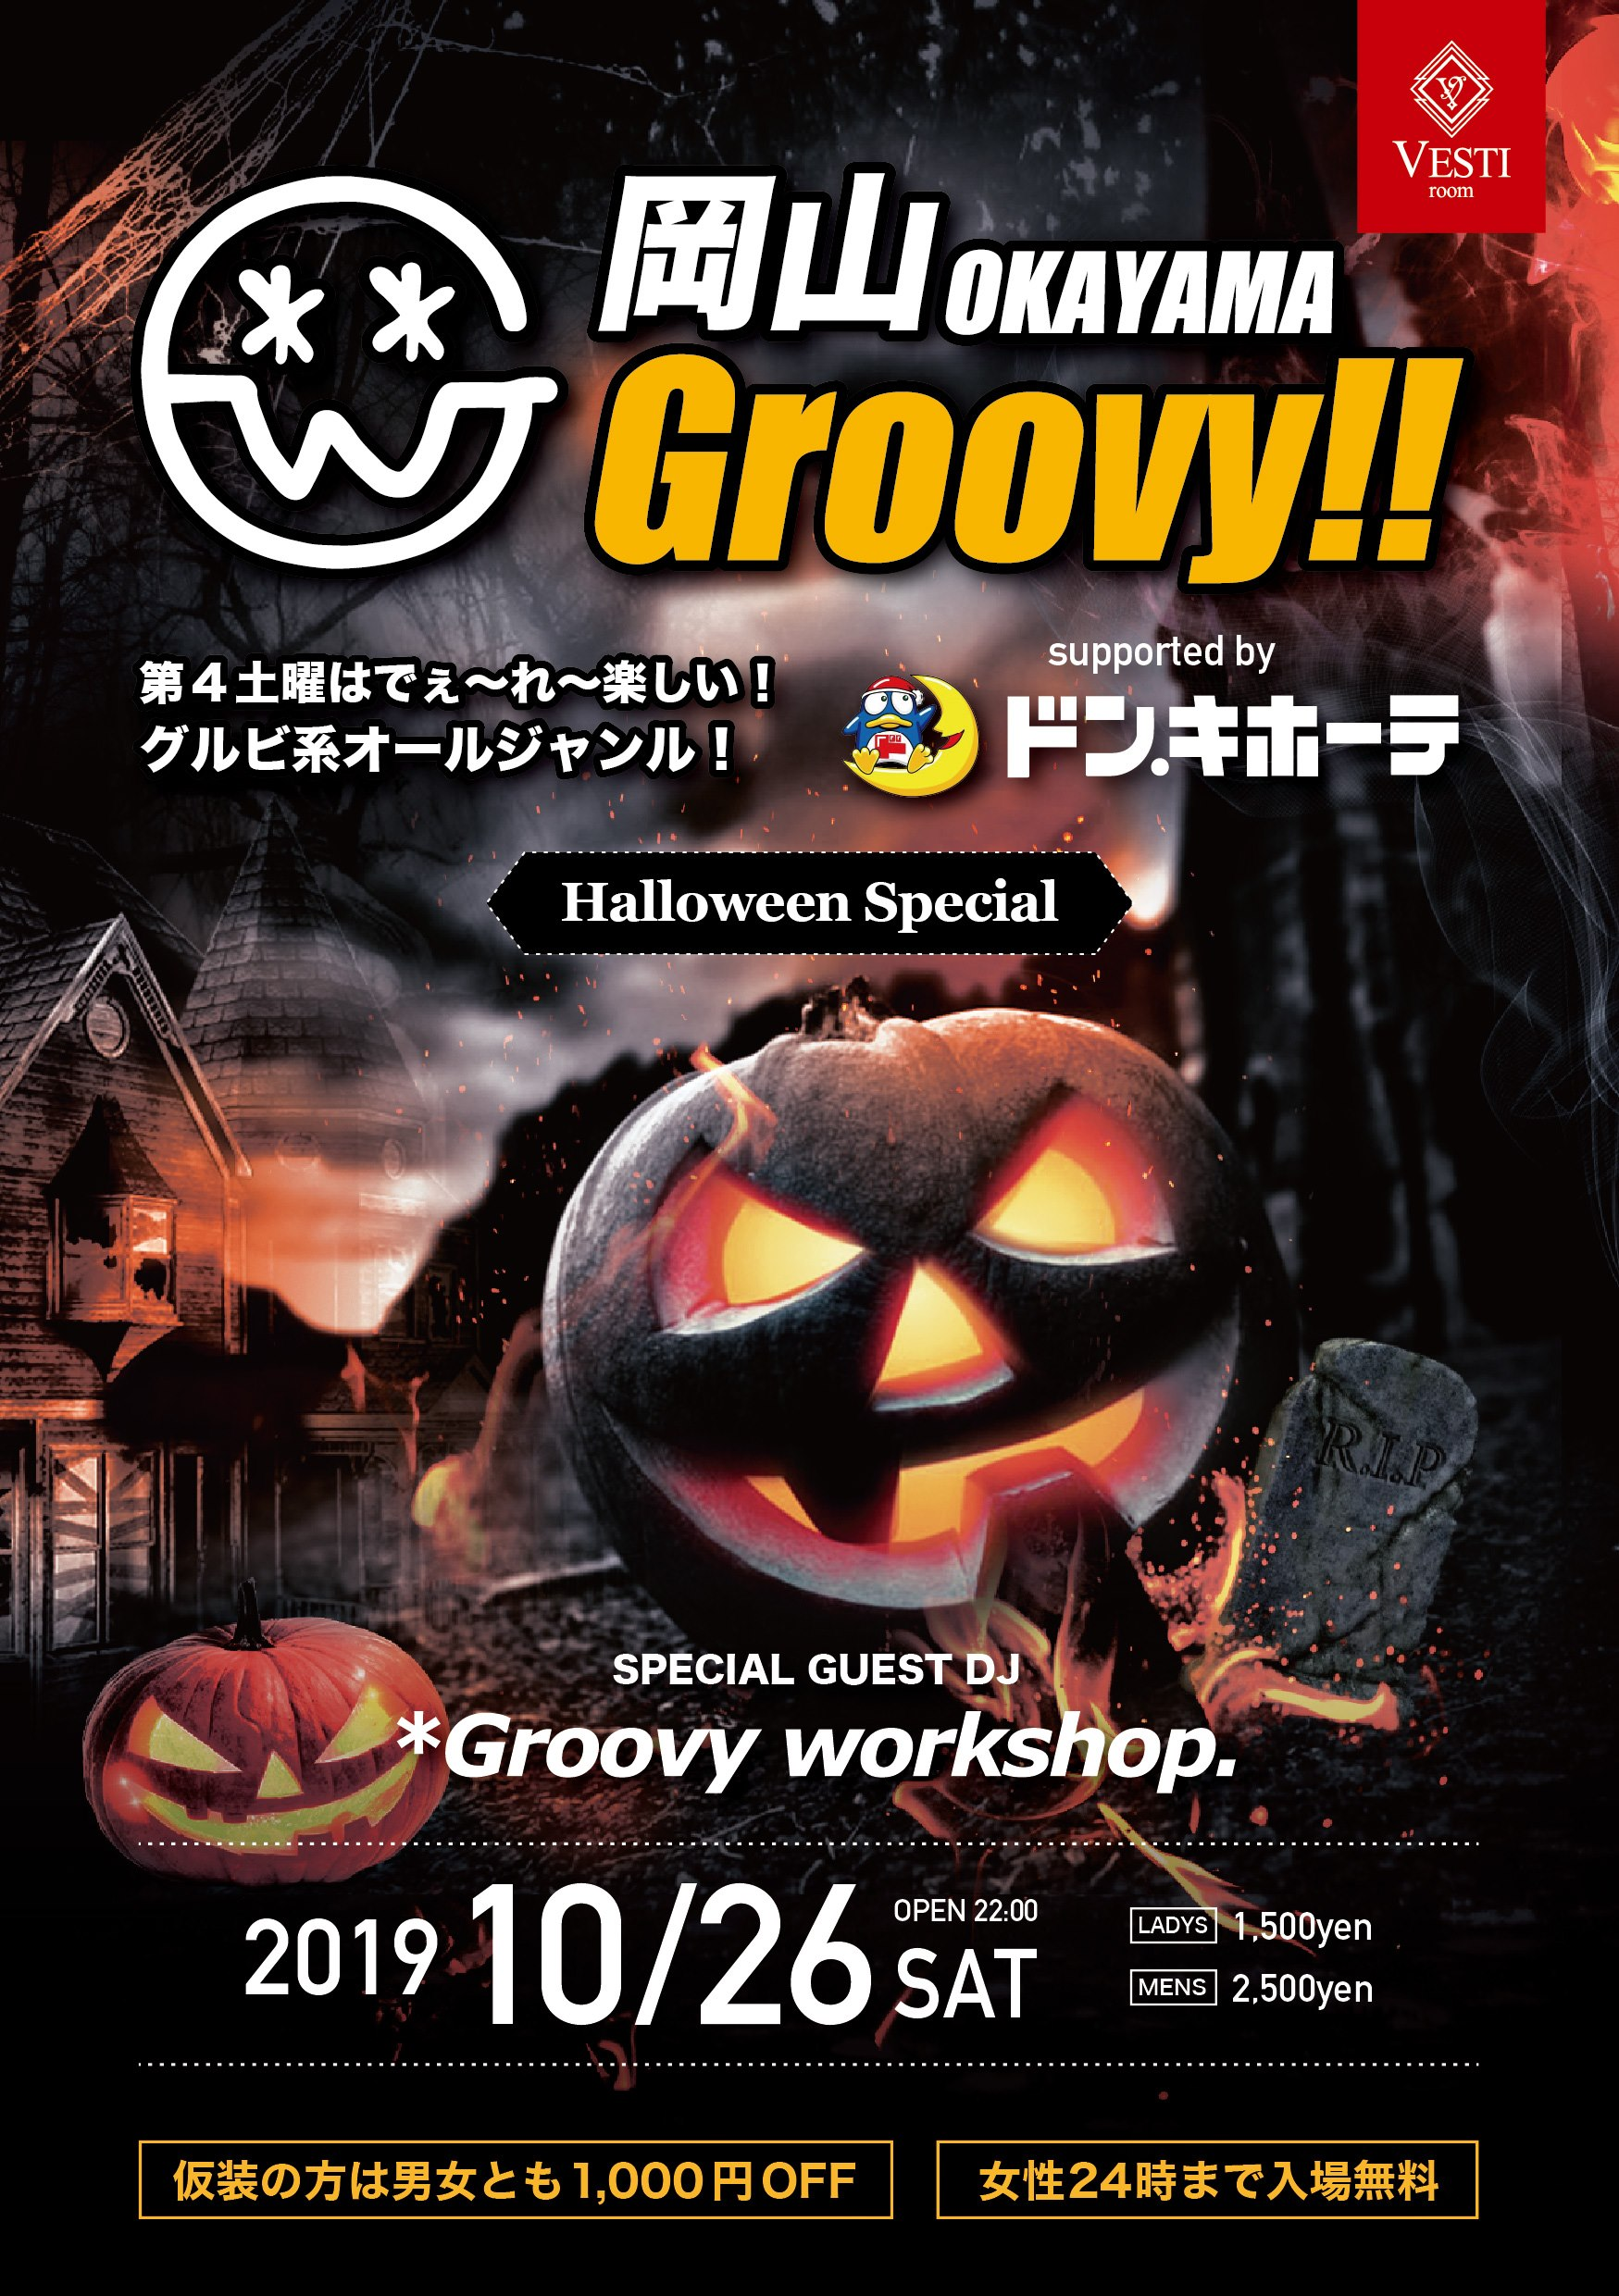 岡山Groovy!! ~HALLOWEEN PARTY ~